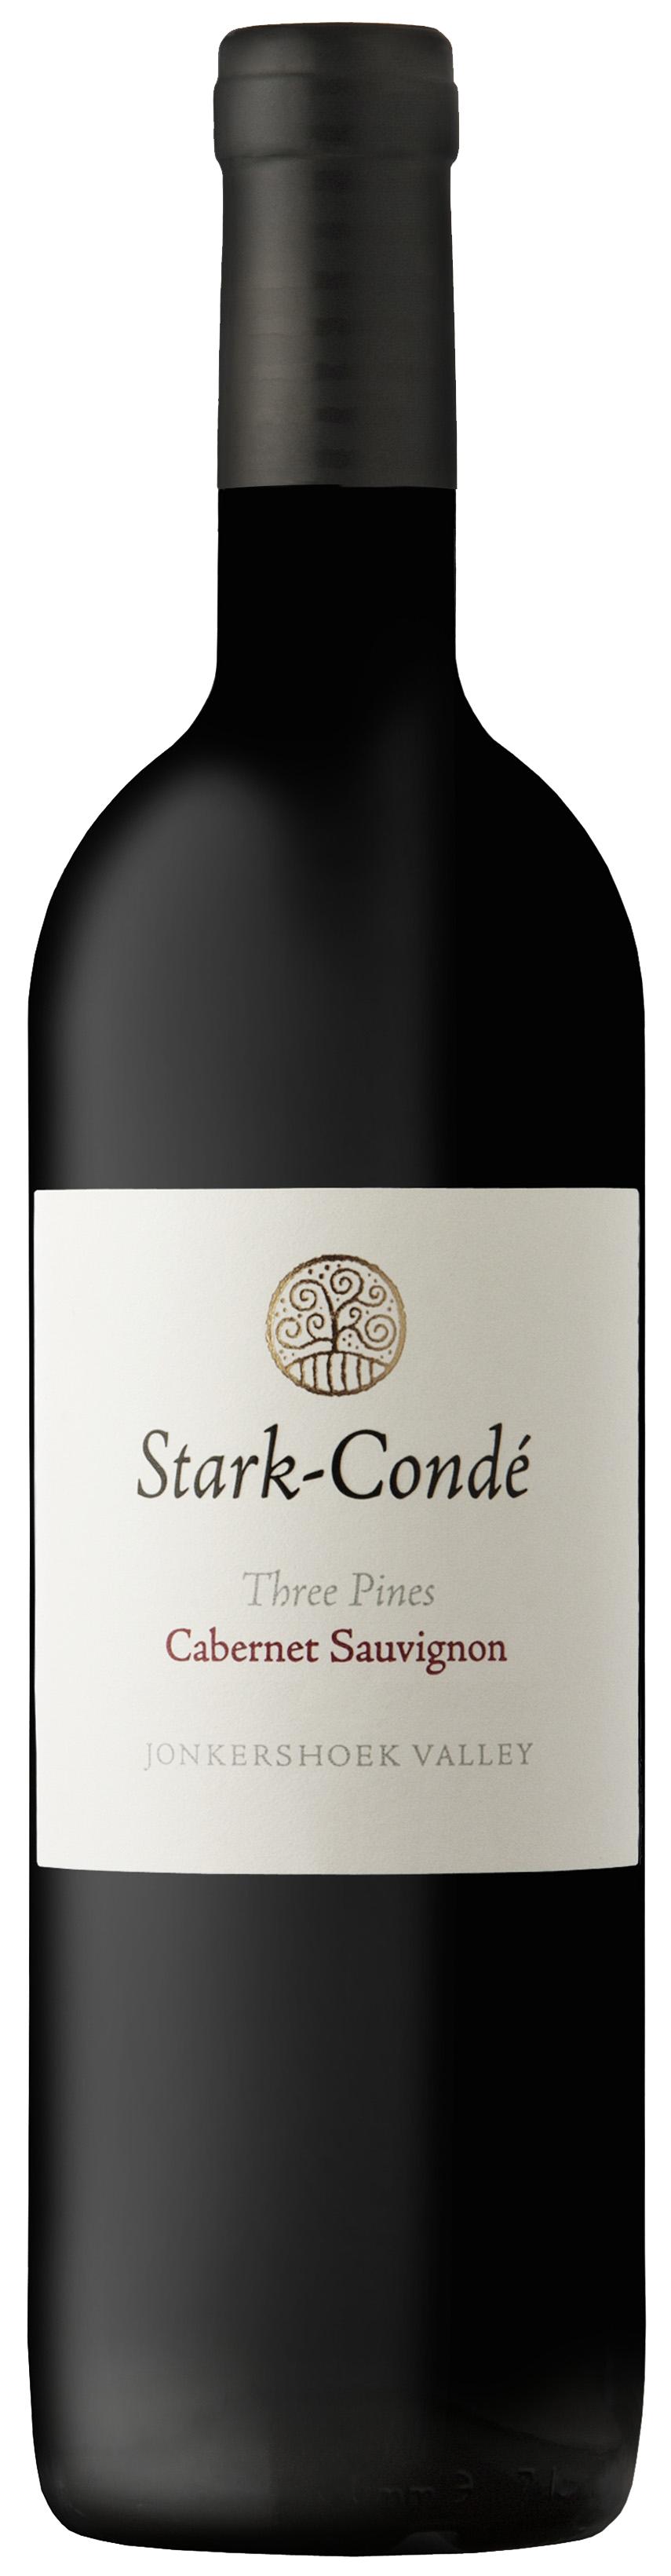 Stark-Condé Three Pines Cabernet Sauvignon Bottle.jpg